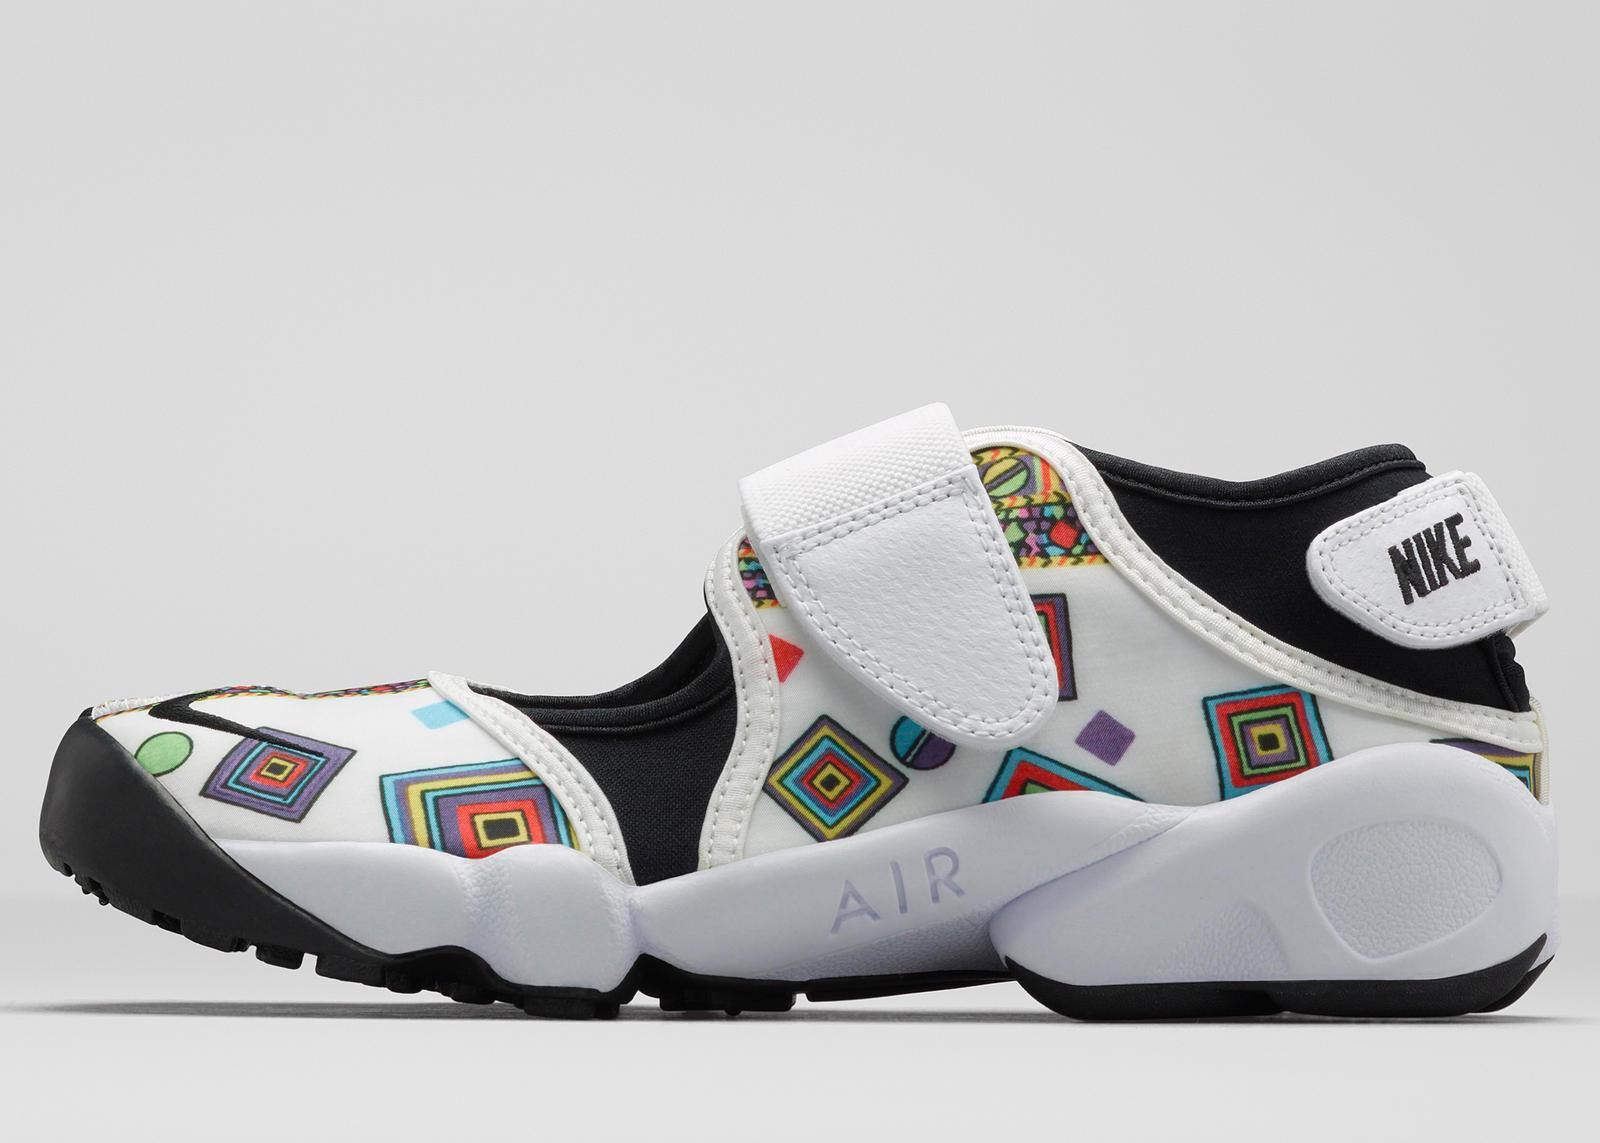 Nike_Liberty_AirRift_Merlin